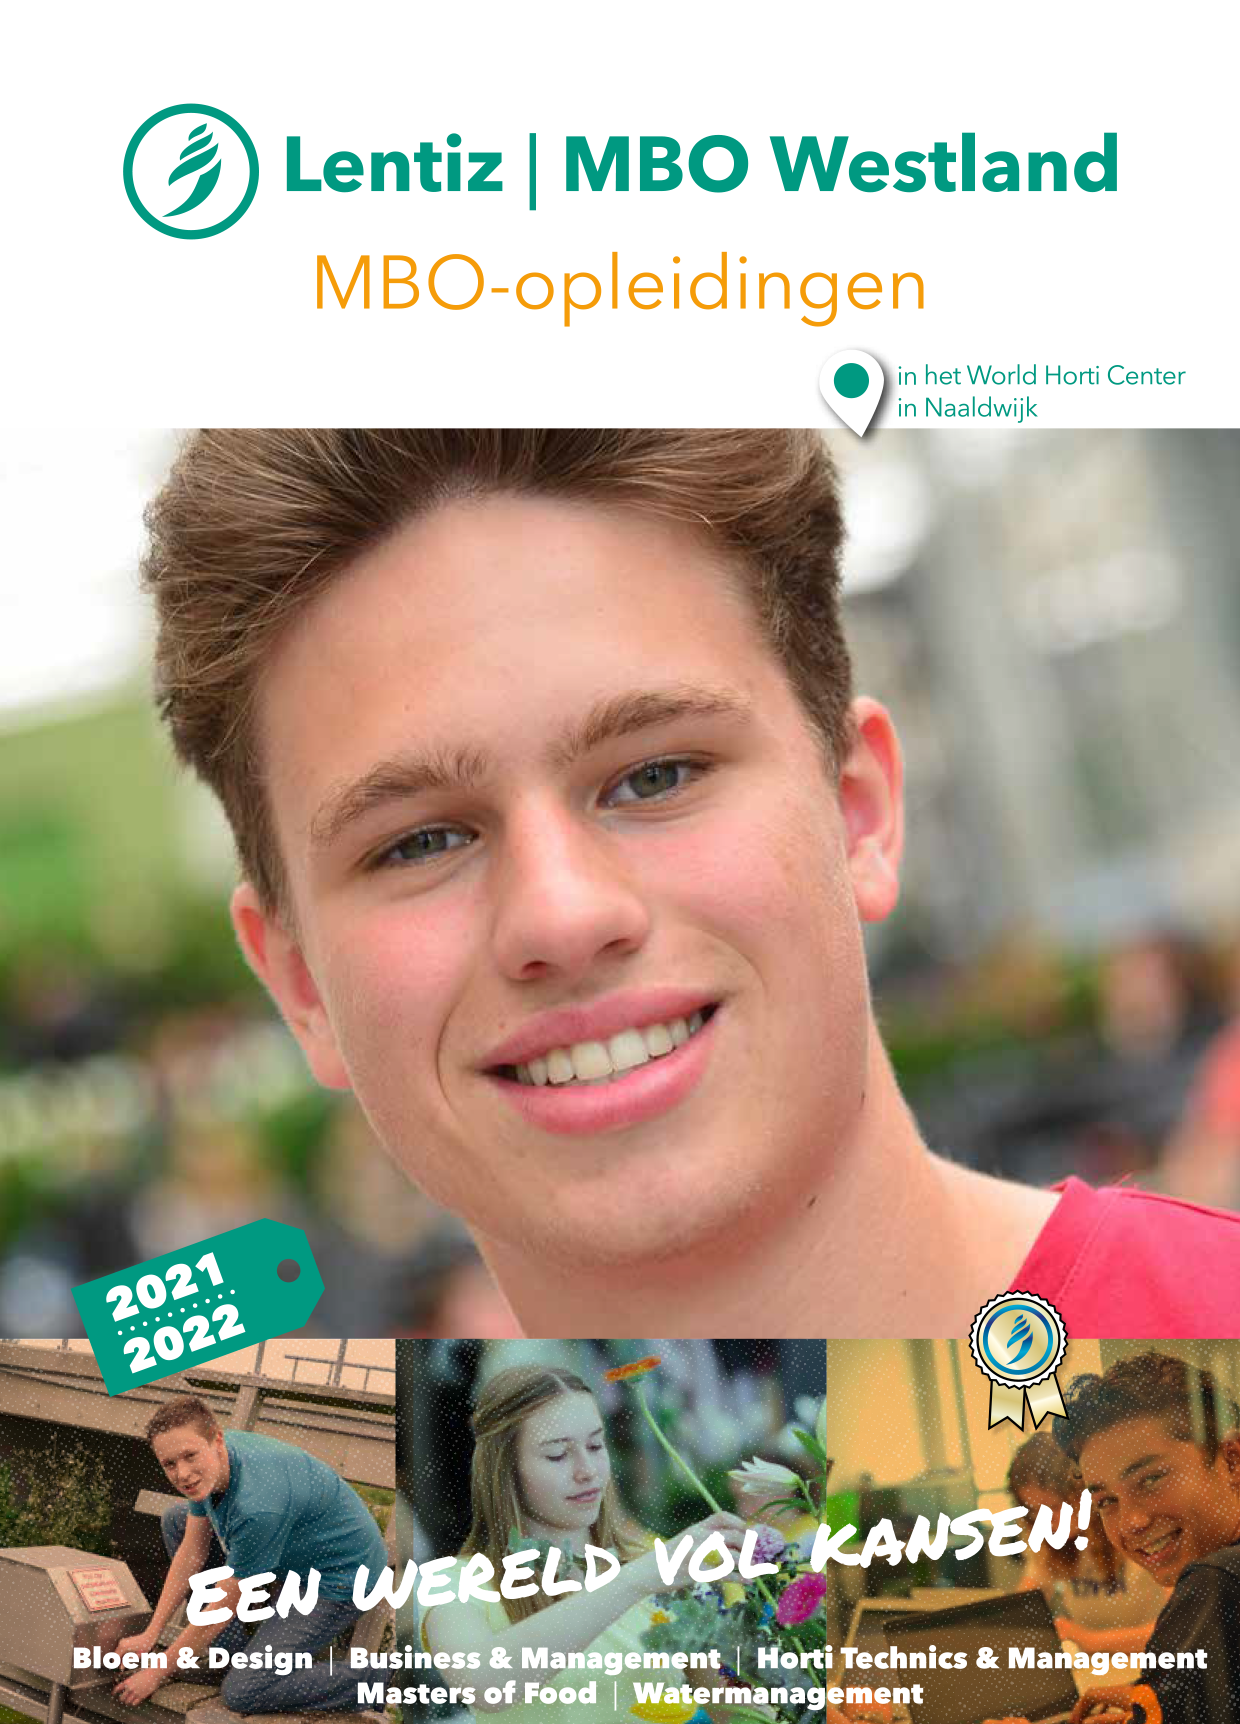 voorkant brochure Lentiz | MBO Westland